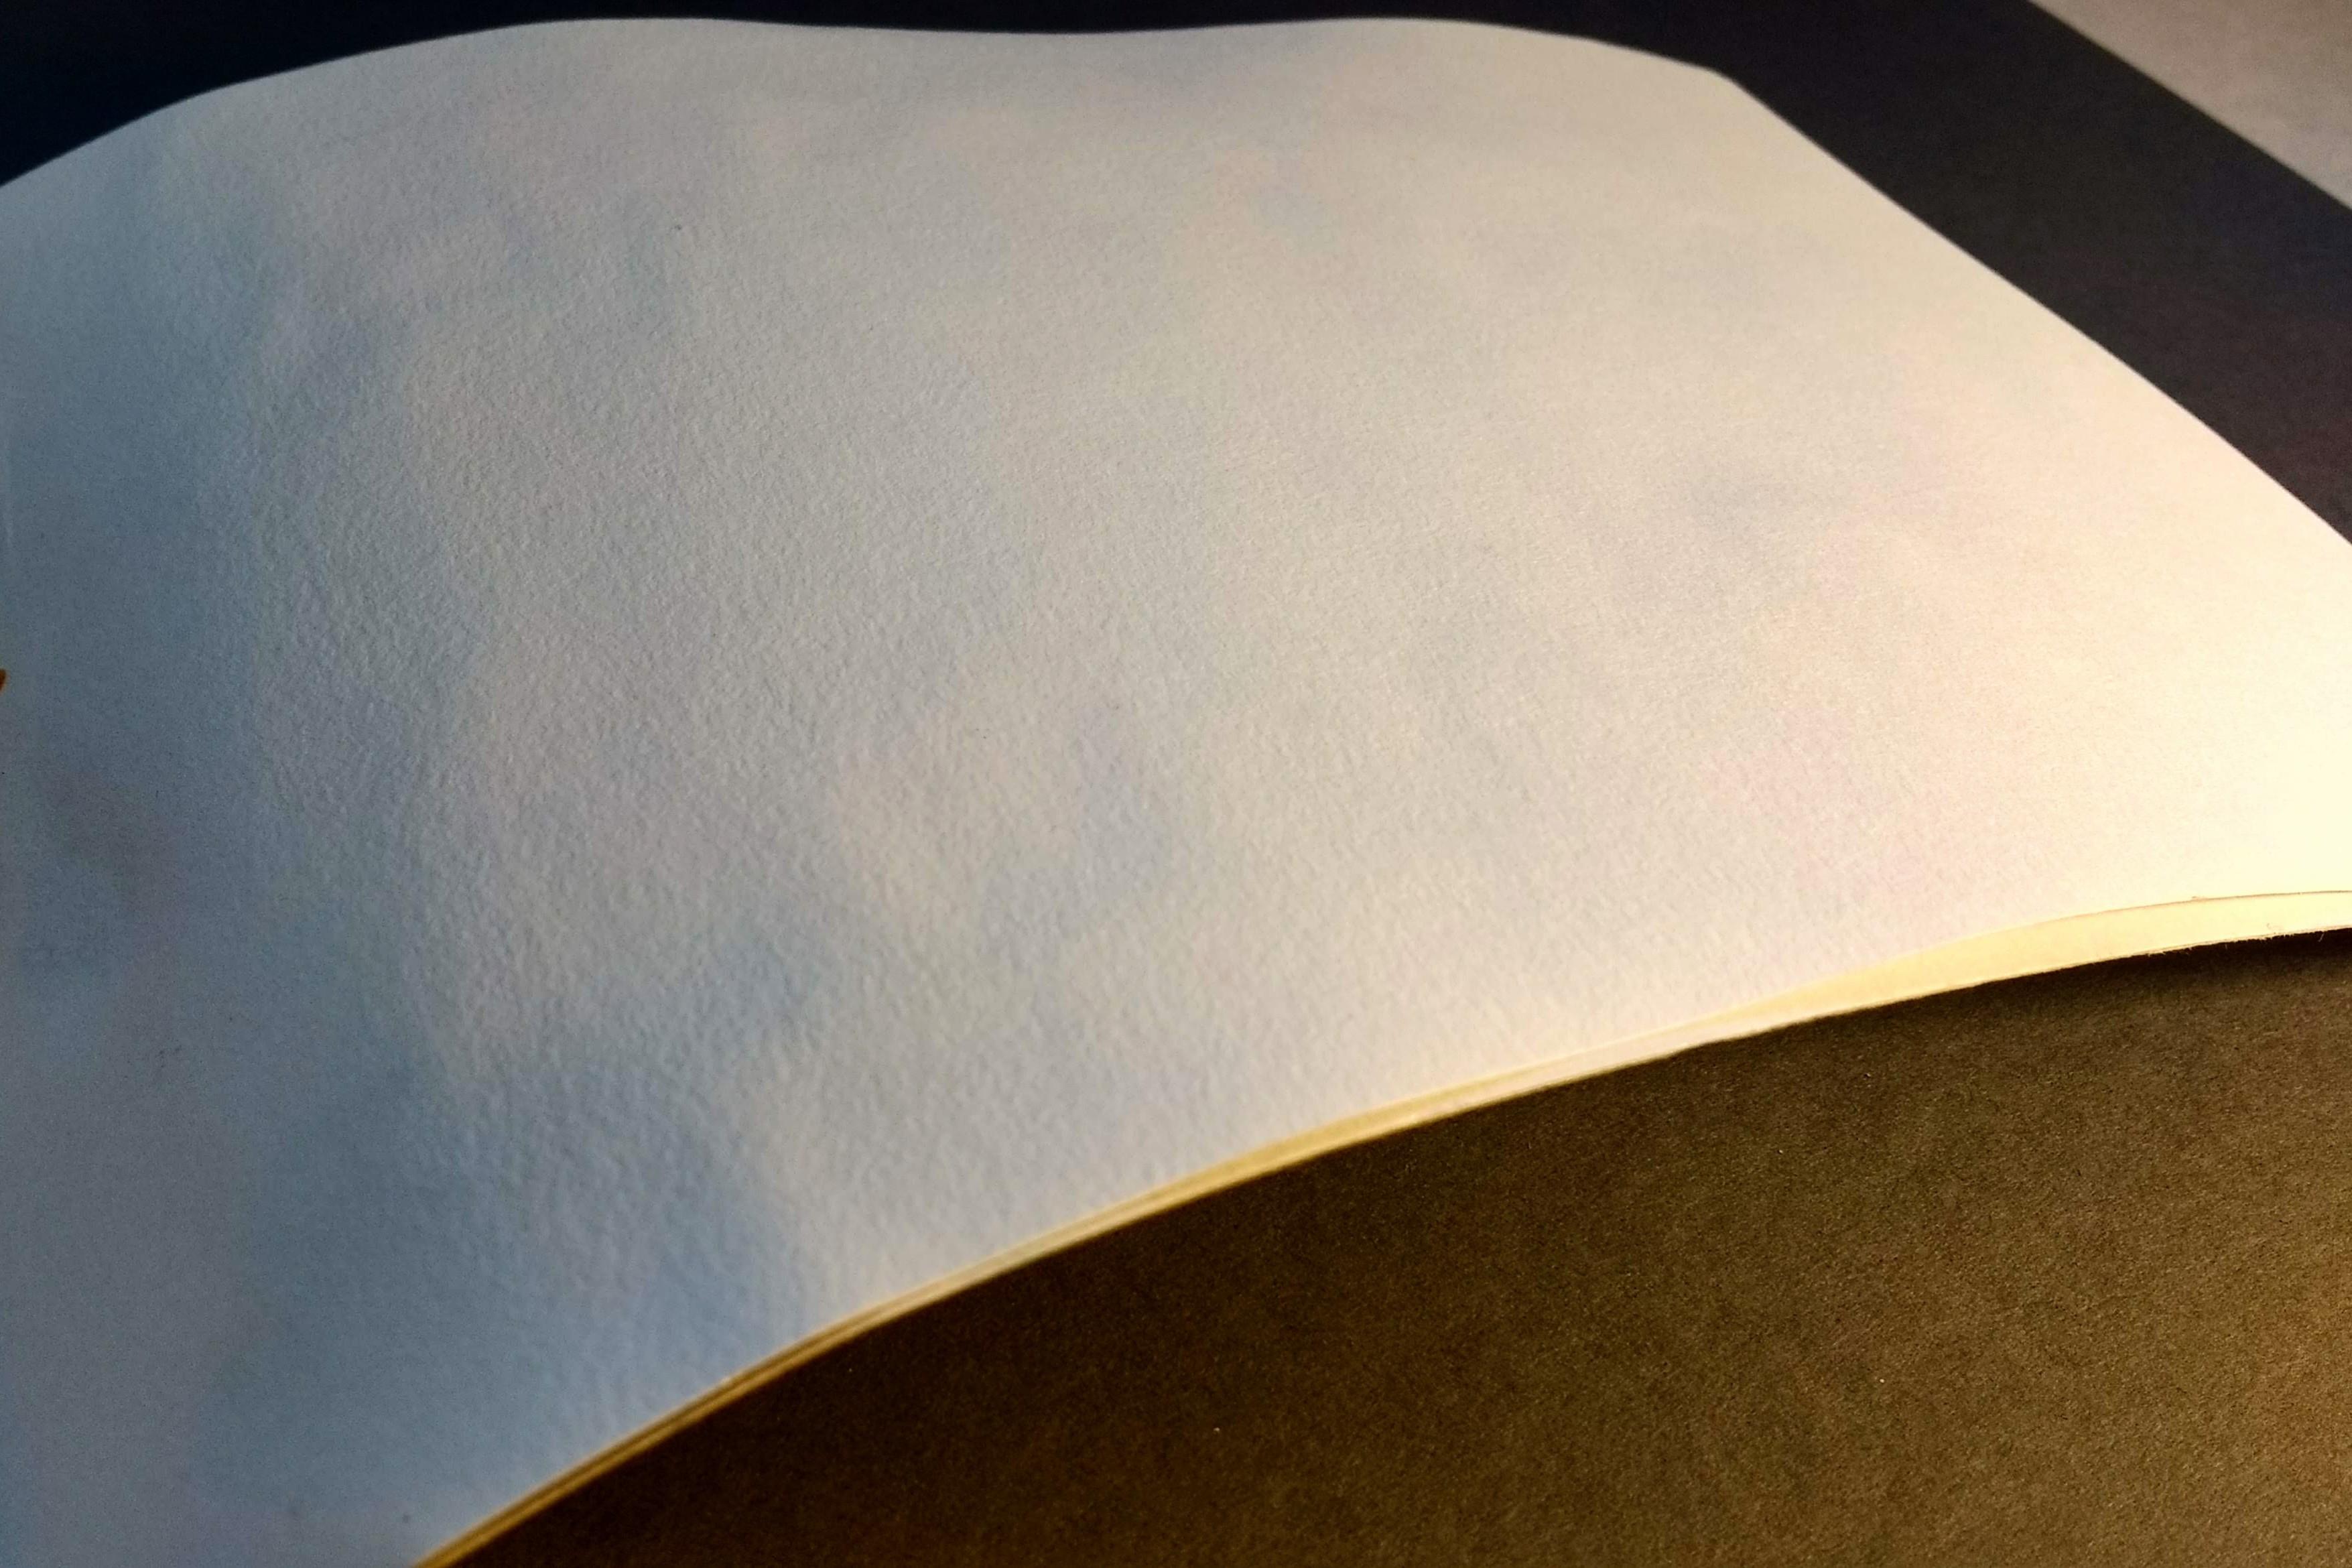 Stillman & Birn- the back of a wet page